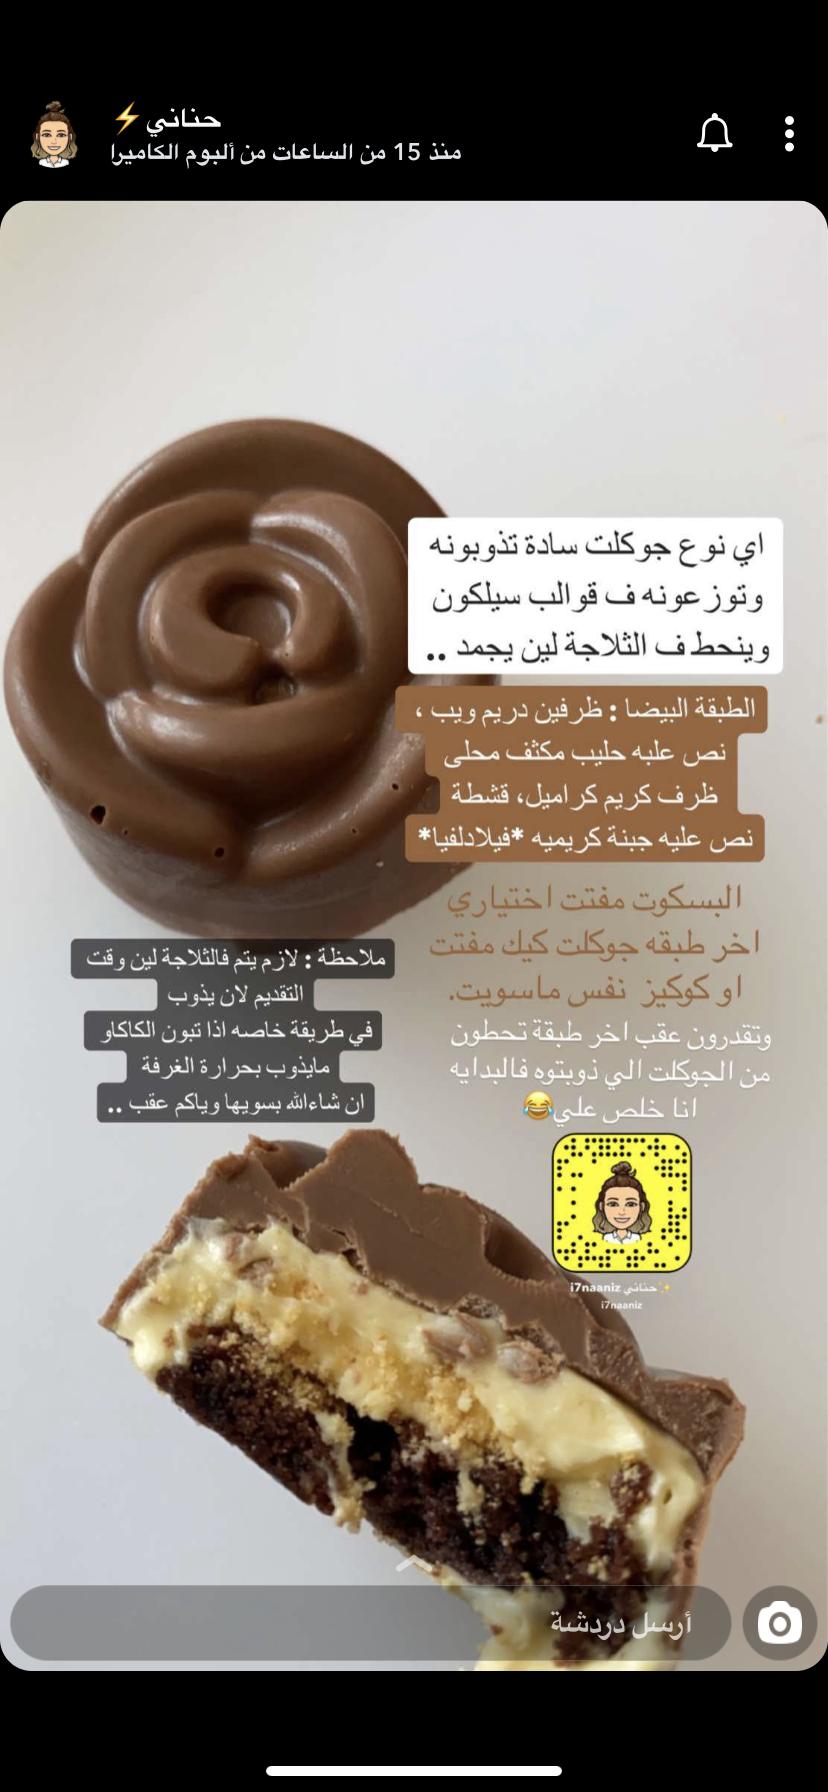 Pin By Hdoosh On طبخ Yummy Food Dessert Food Videos Desserts Food Drinks Dessert